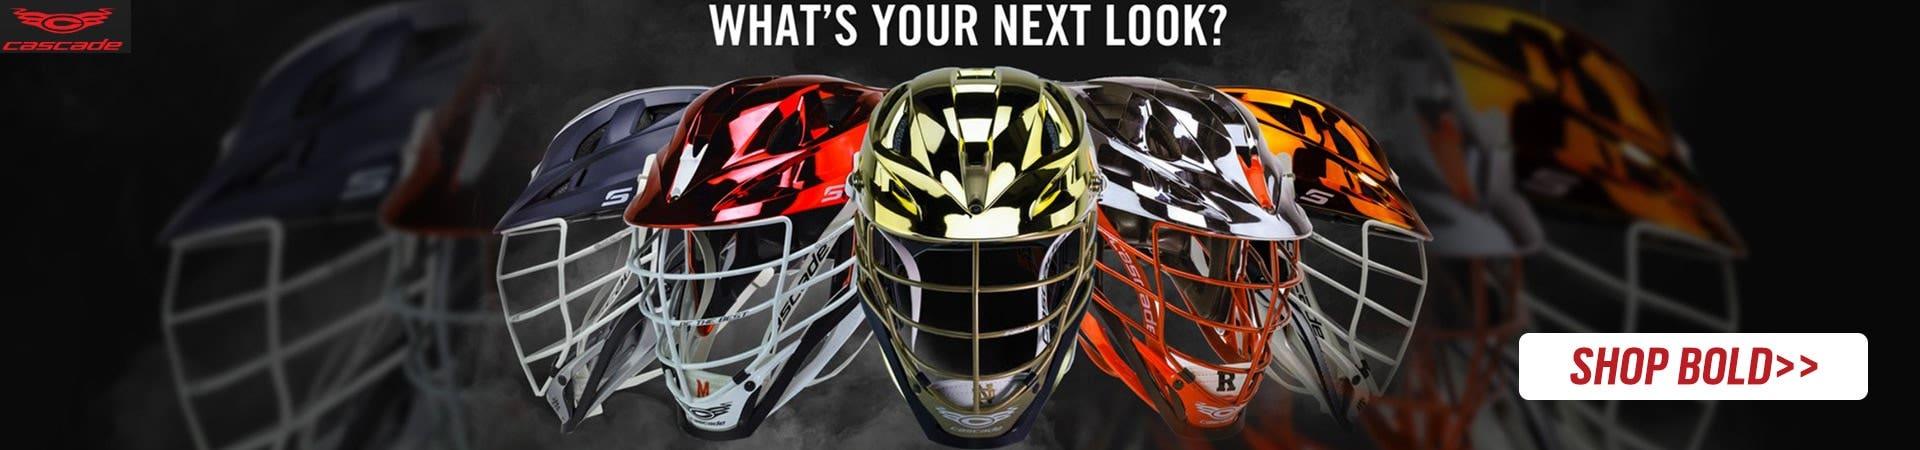 Cascade S Lacrosse Helmet - Customizable